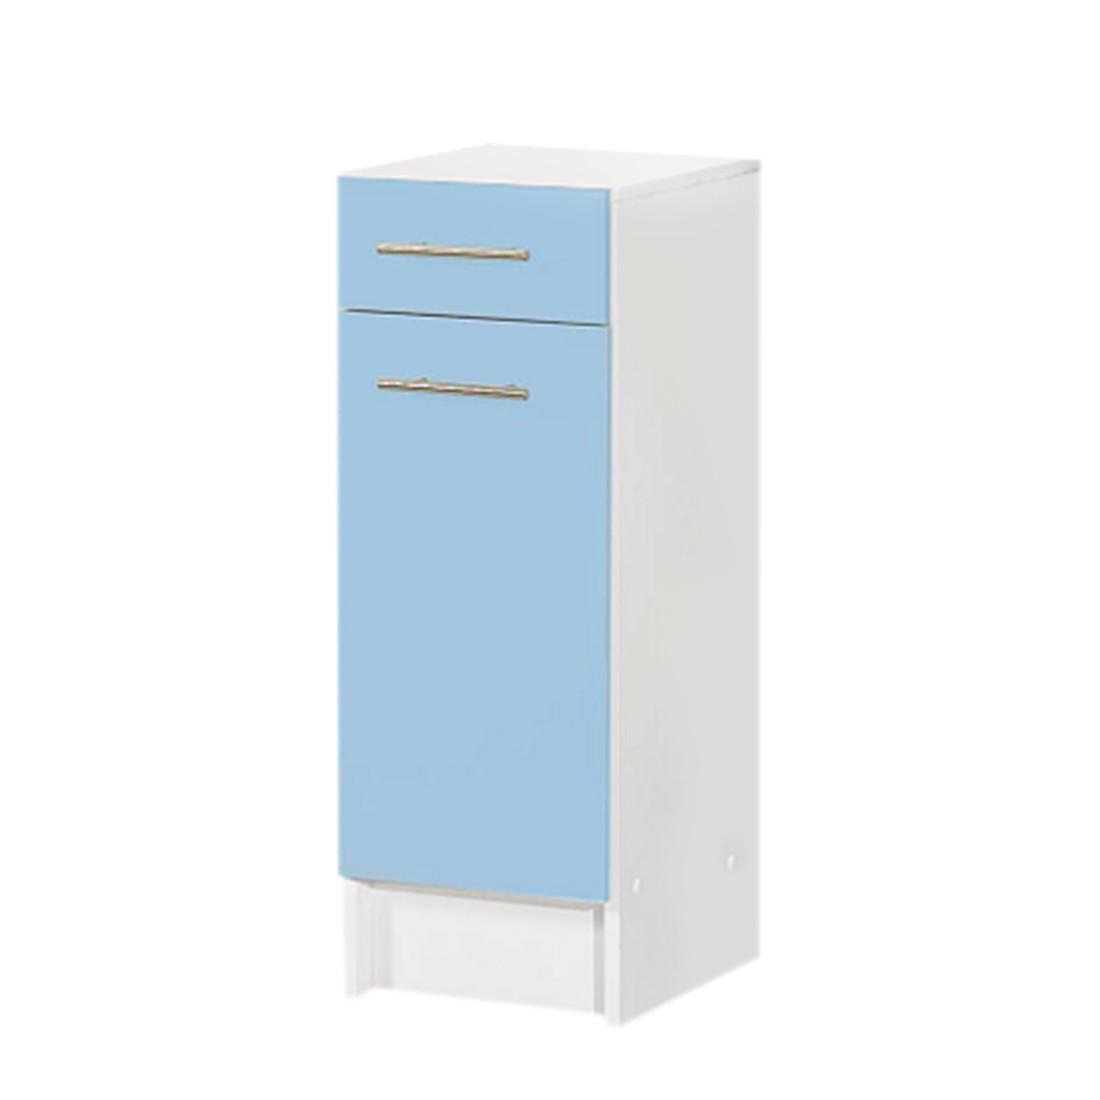 Badkamerkastje Ottawa - met sokkel - lichtblauw, Schildmeyer